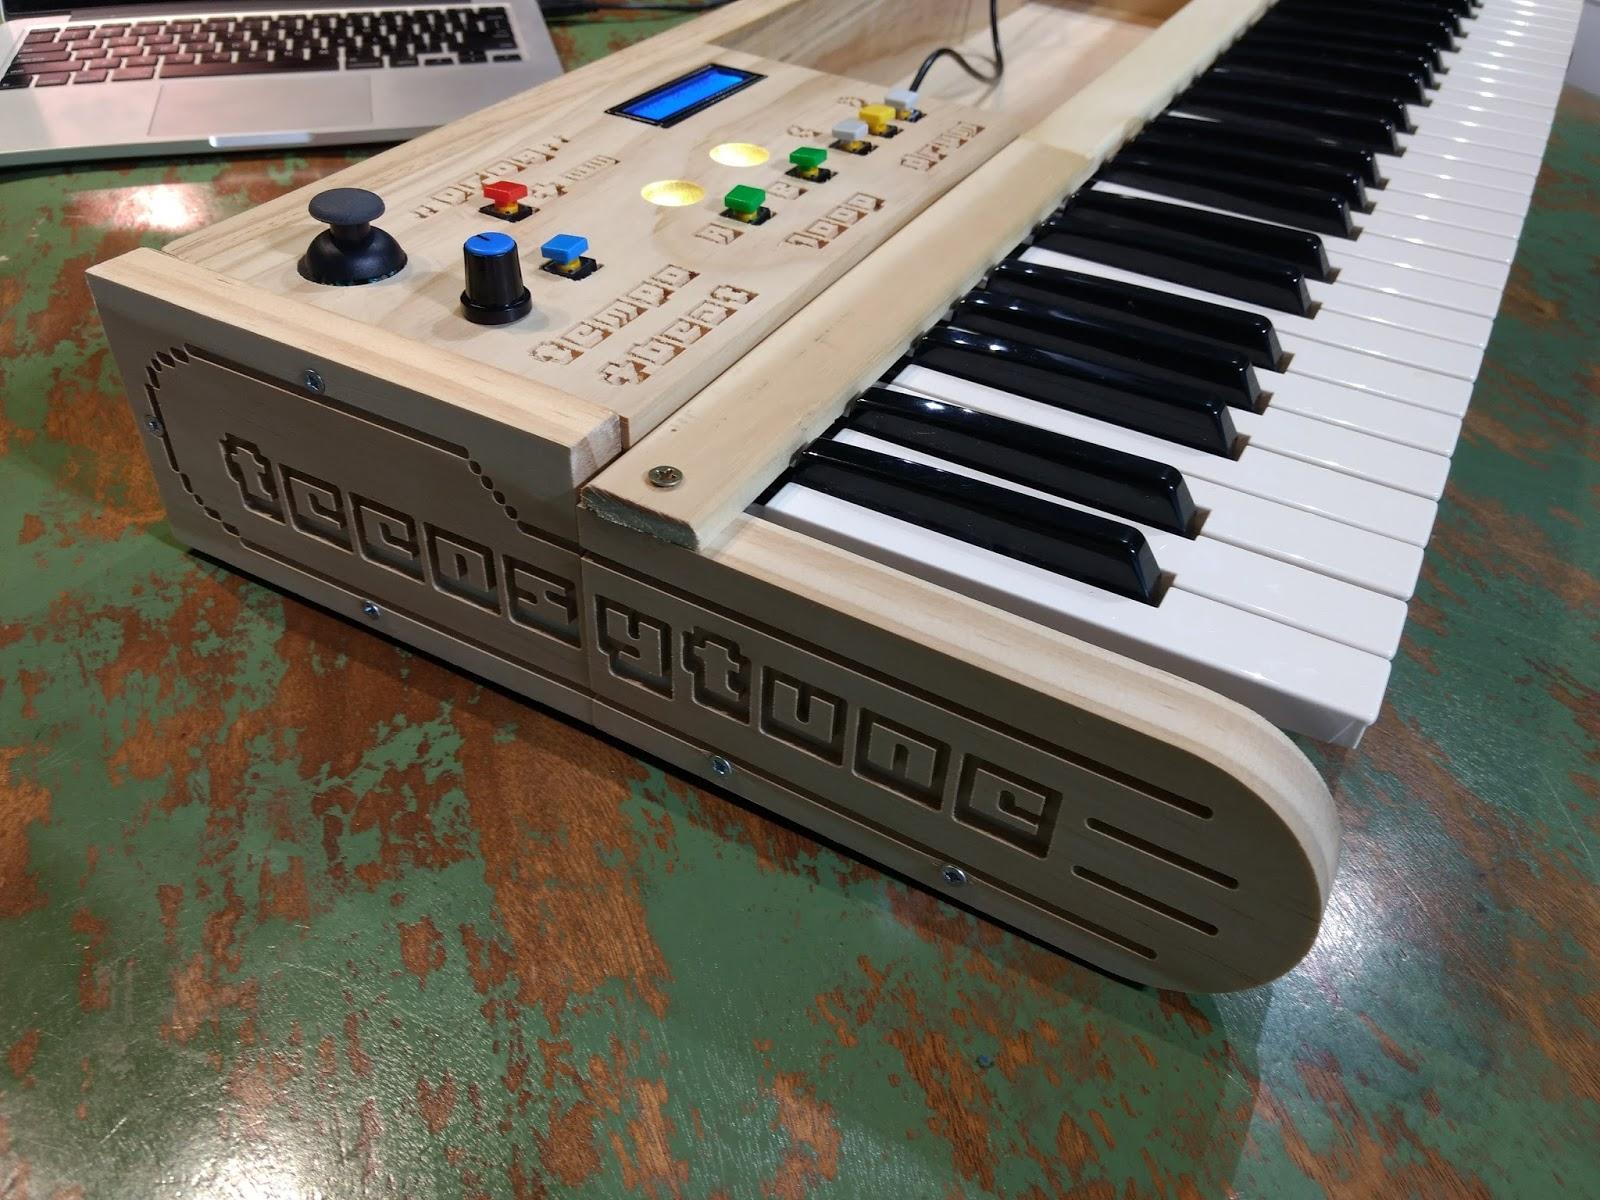 random project lab teensytune a teensy based midi controller keyboard. Black Bedroom Furniture Sets. Home Design Ideas